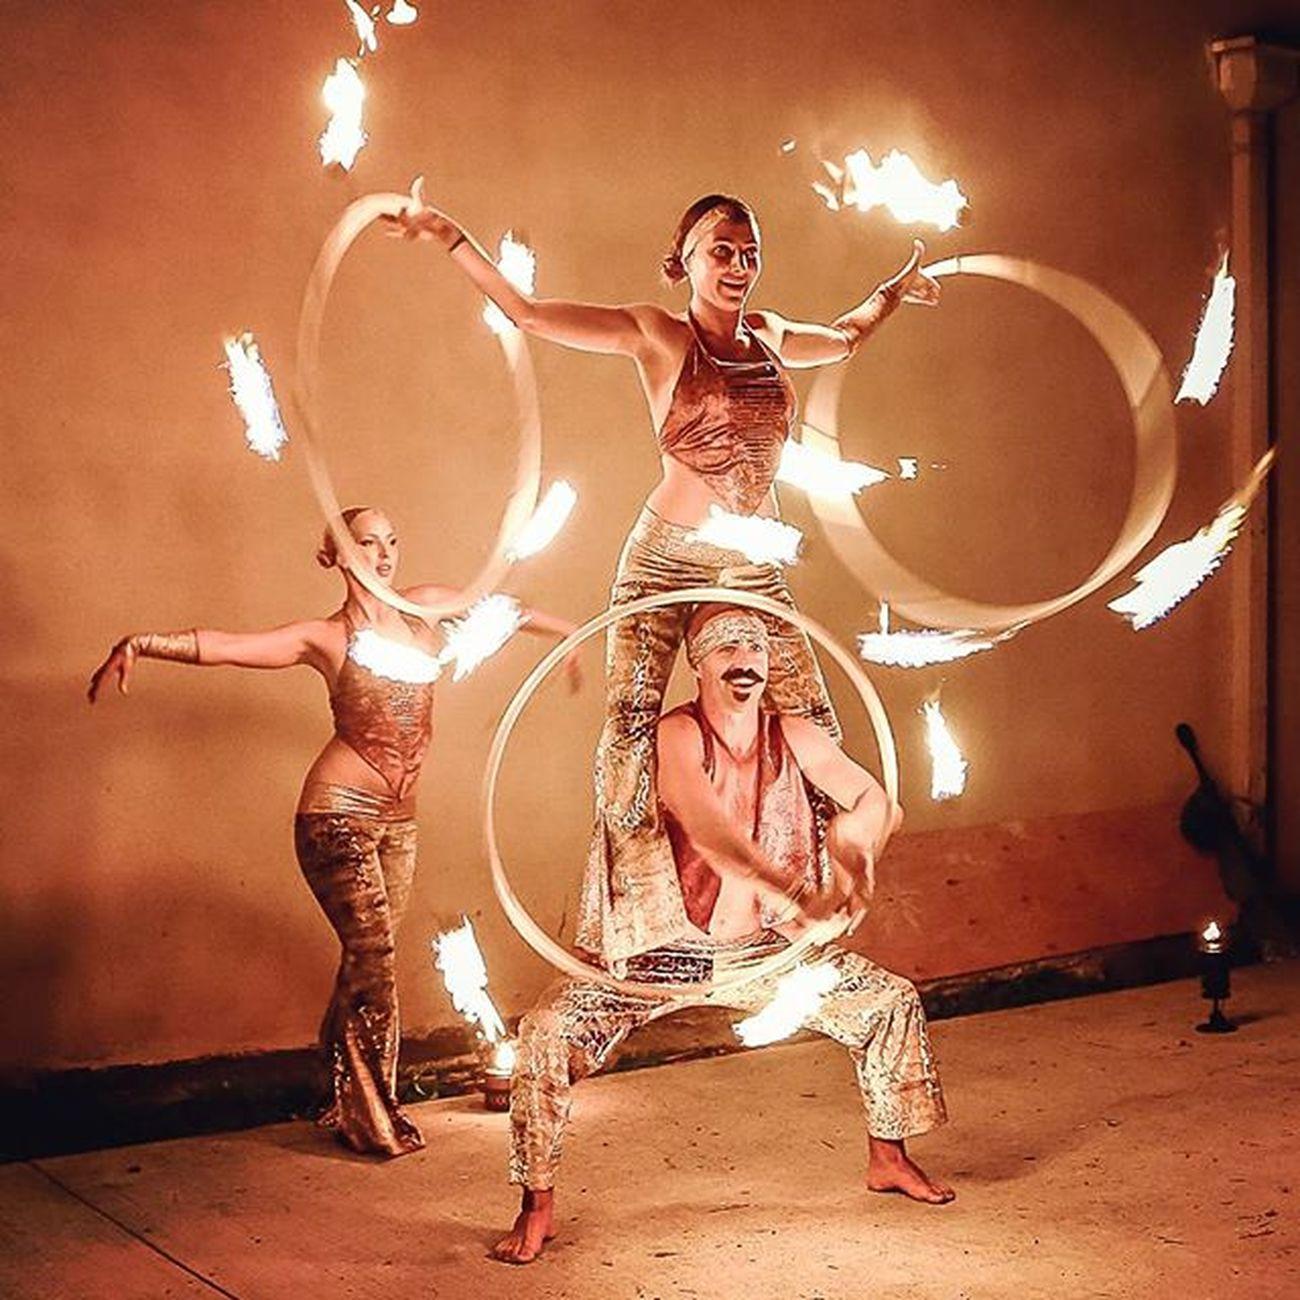 Pyro love featured on hooping.org Beautiful Maui Firedance FireDancers Fire Befree Youonlyliveonce Firehoop Hoop Hoops Hoopingdotorg Hooping  Hooper Fireporn Pyro Pyrohearted Flowarts Flo Burningman Love Circus Circusfreak Amazing @theurbanunicorn